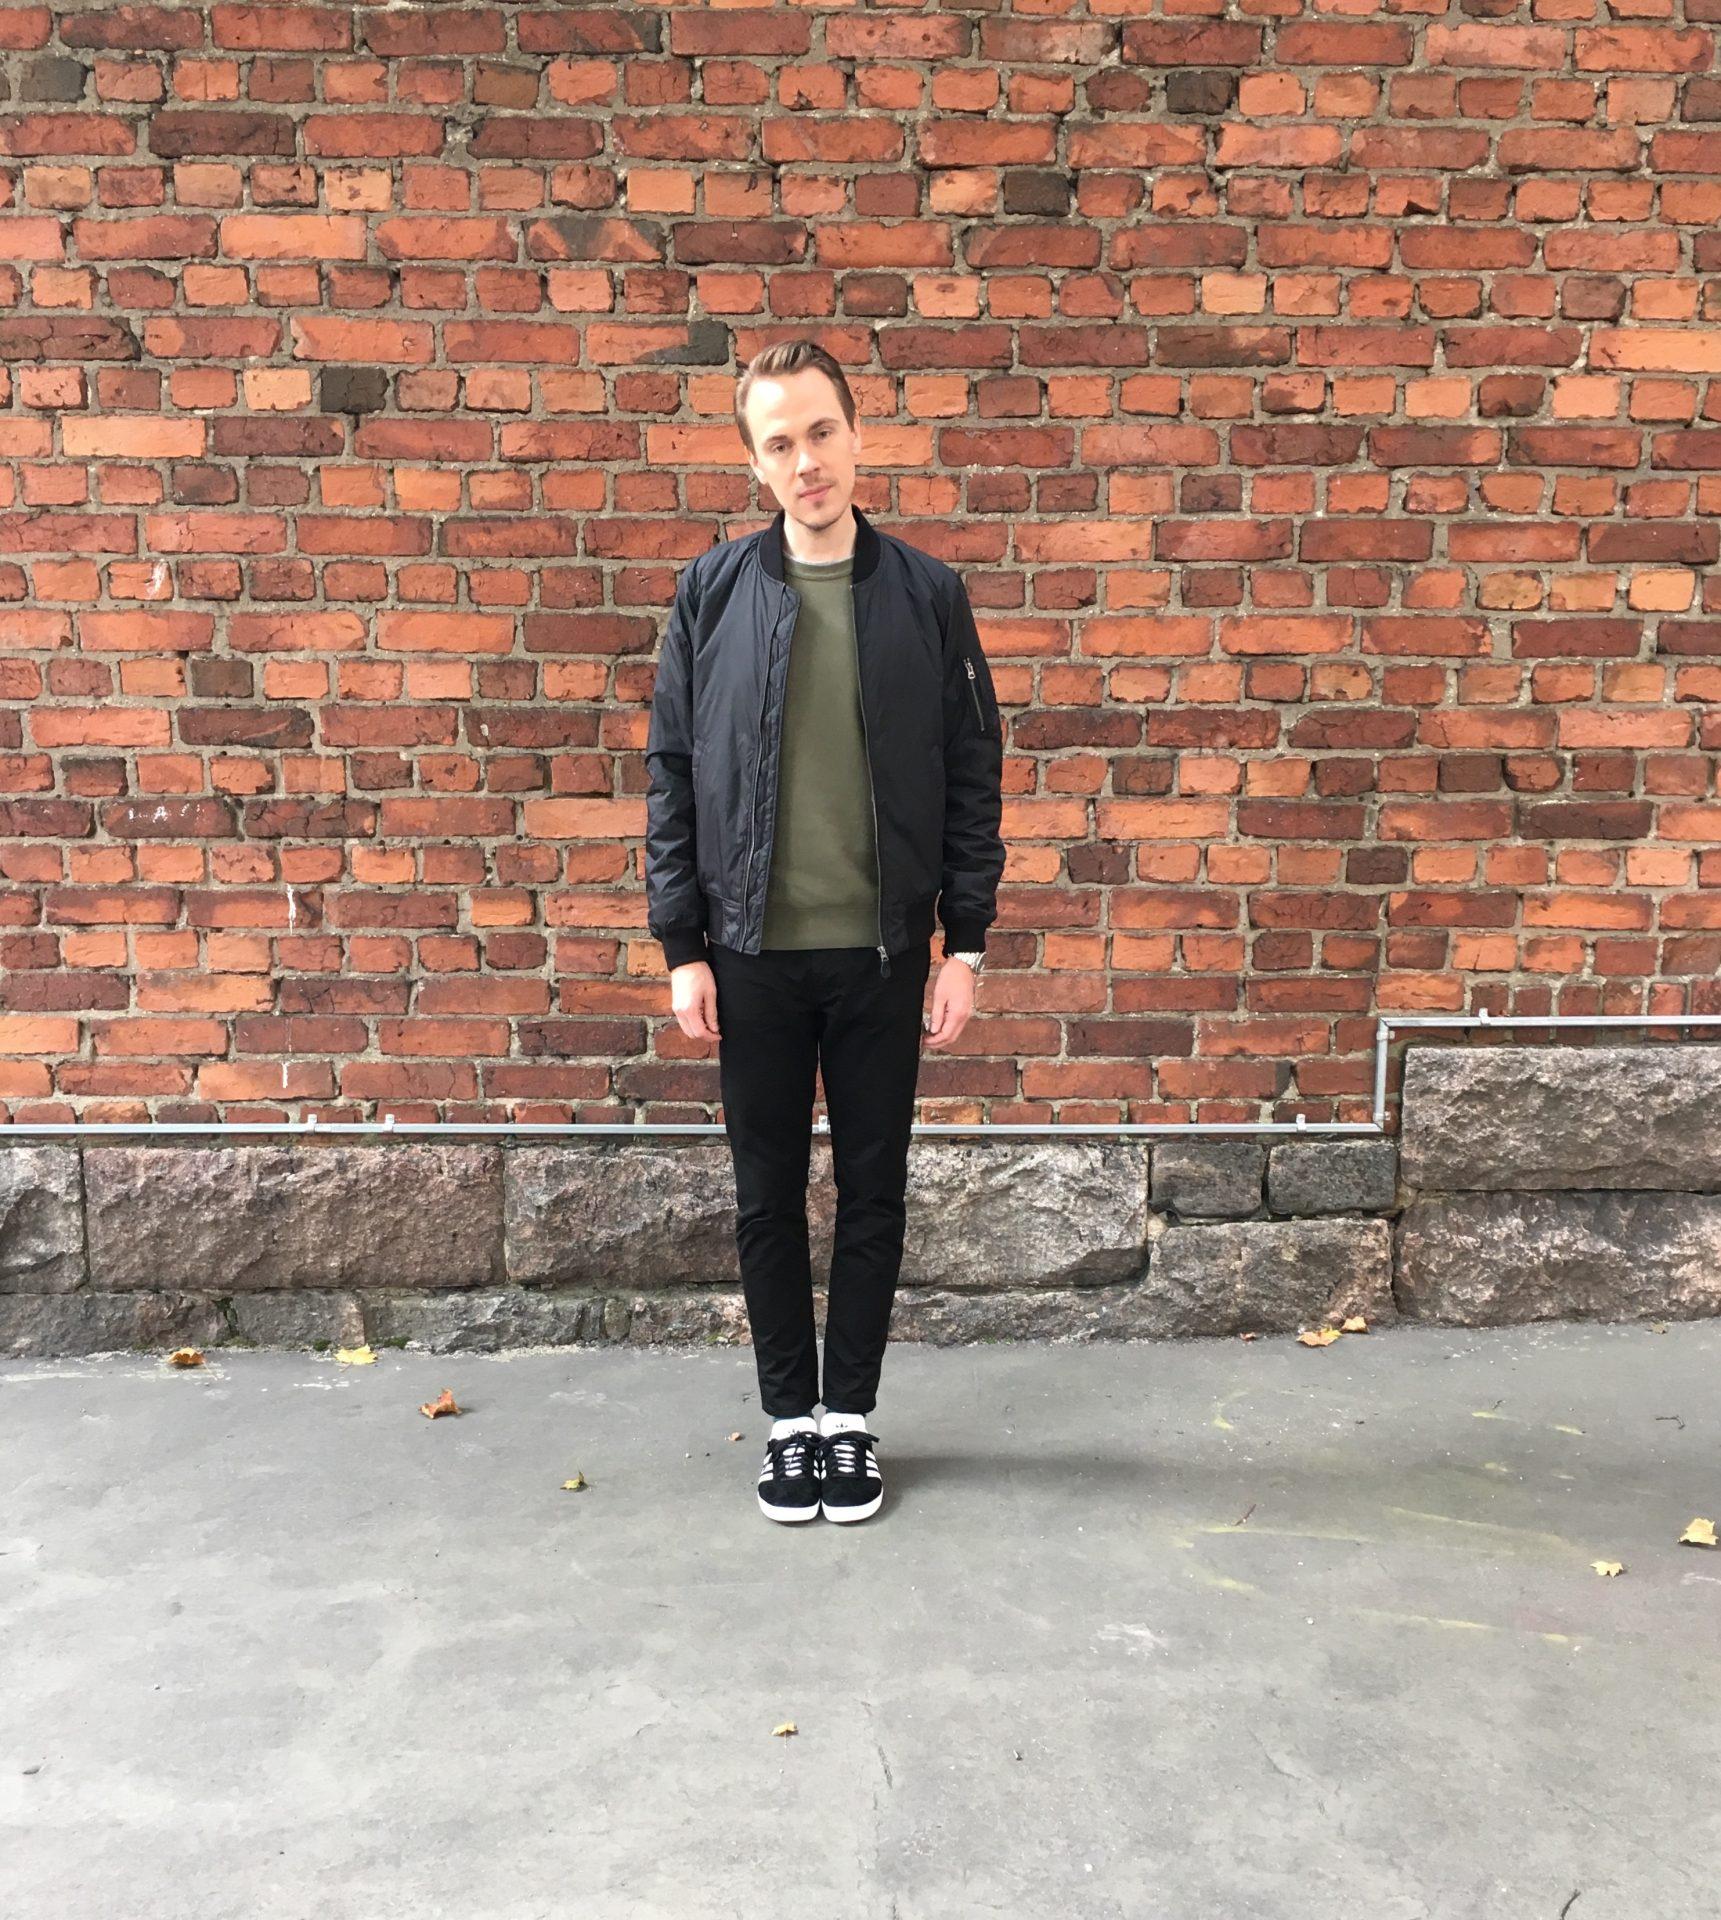 Uniqlo Bomber - Stone Island Sweatshirt - Acne Studios Town TW - Adidas Gazelle